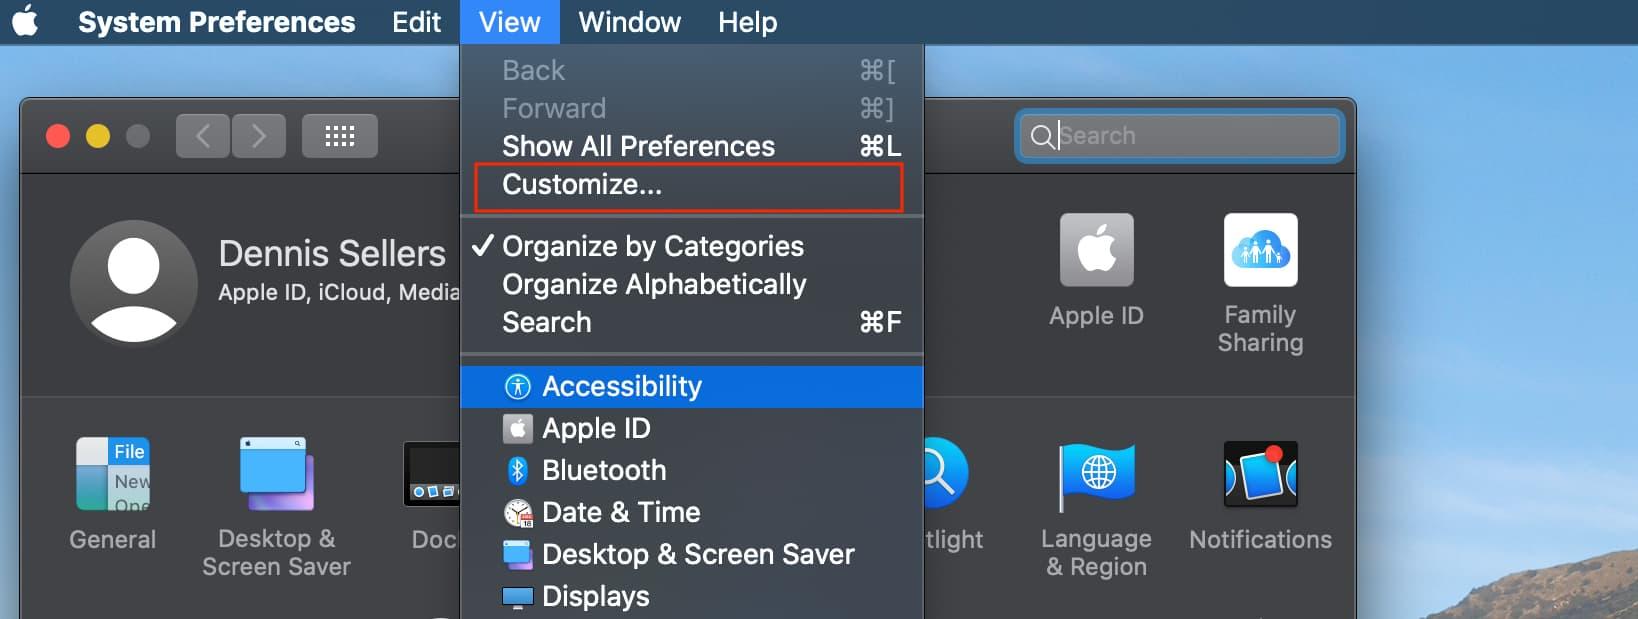 Screenshot of the System Preferences menu